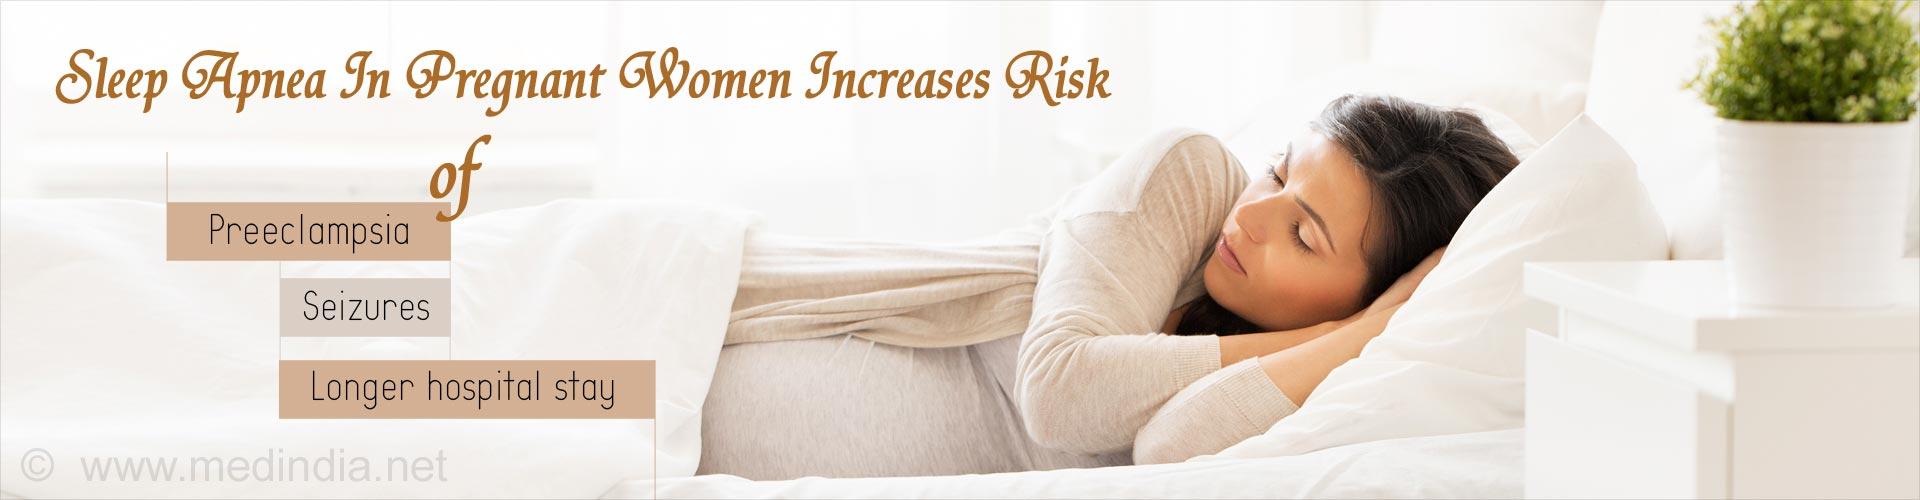 sleep apnea in prgenant women increases risk of preeclampsia, seizures, longer hospital stay